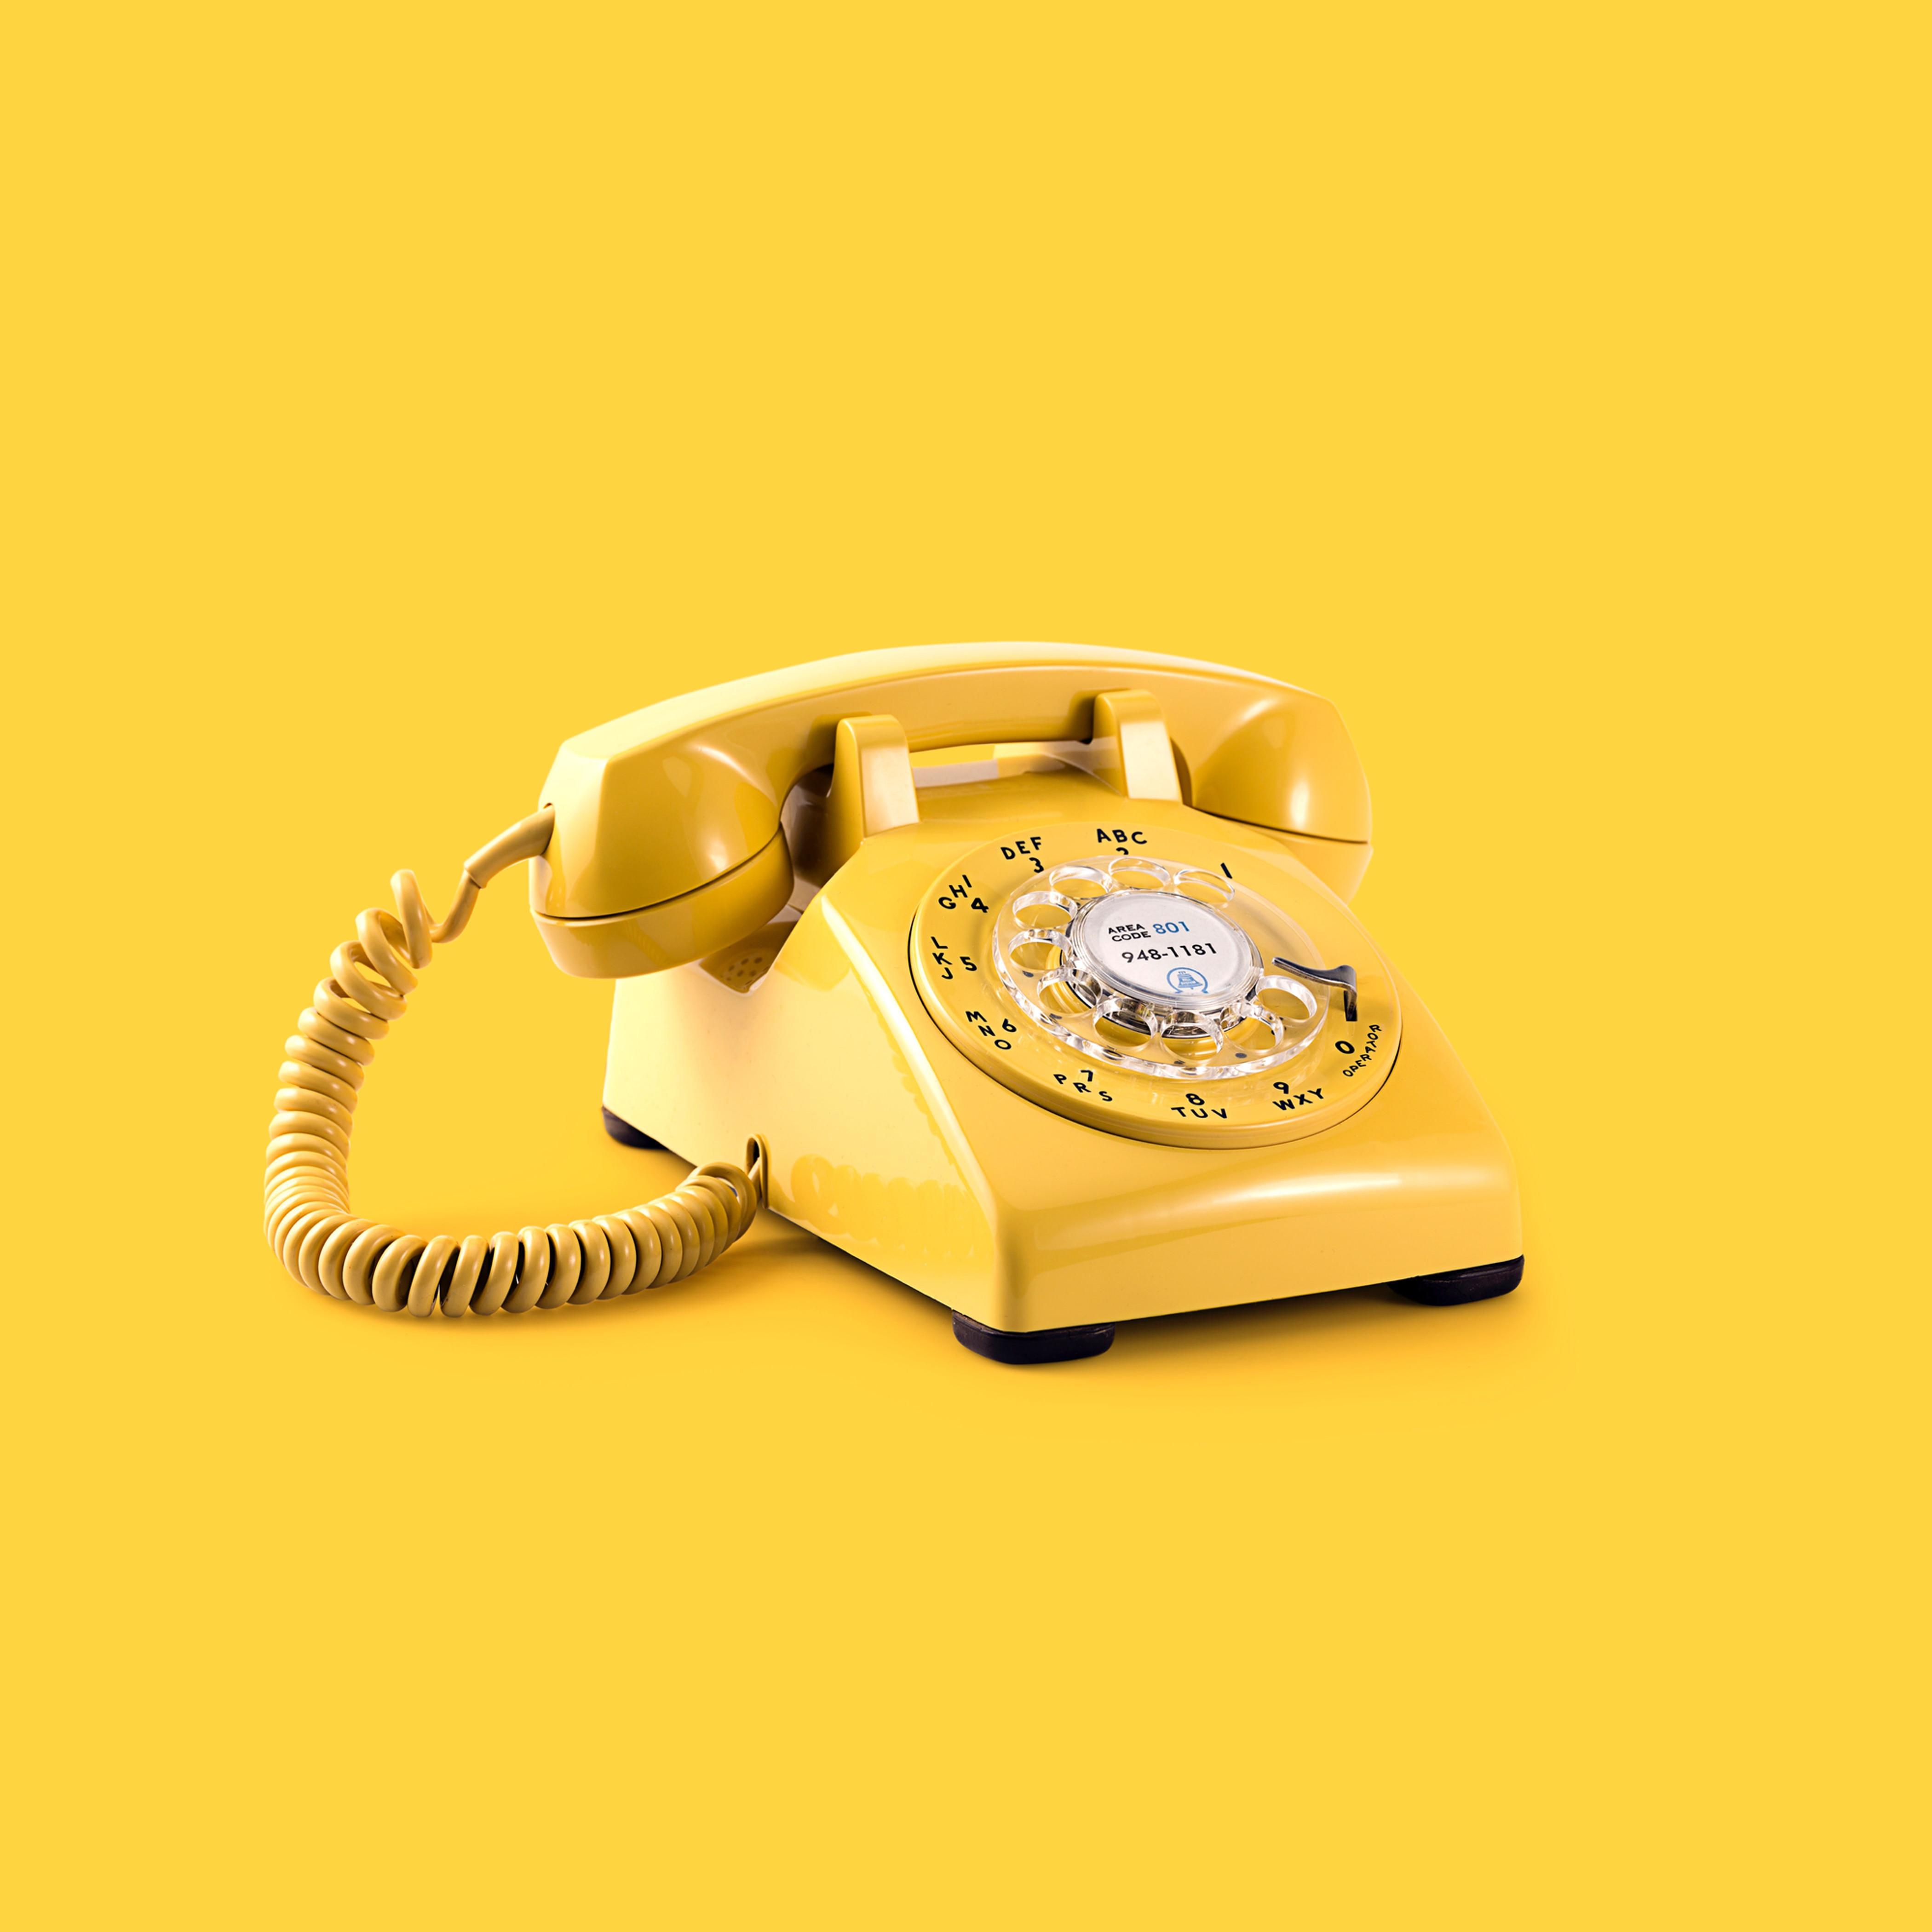 15 min free phone call